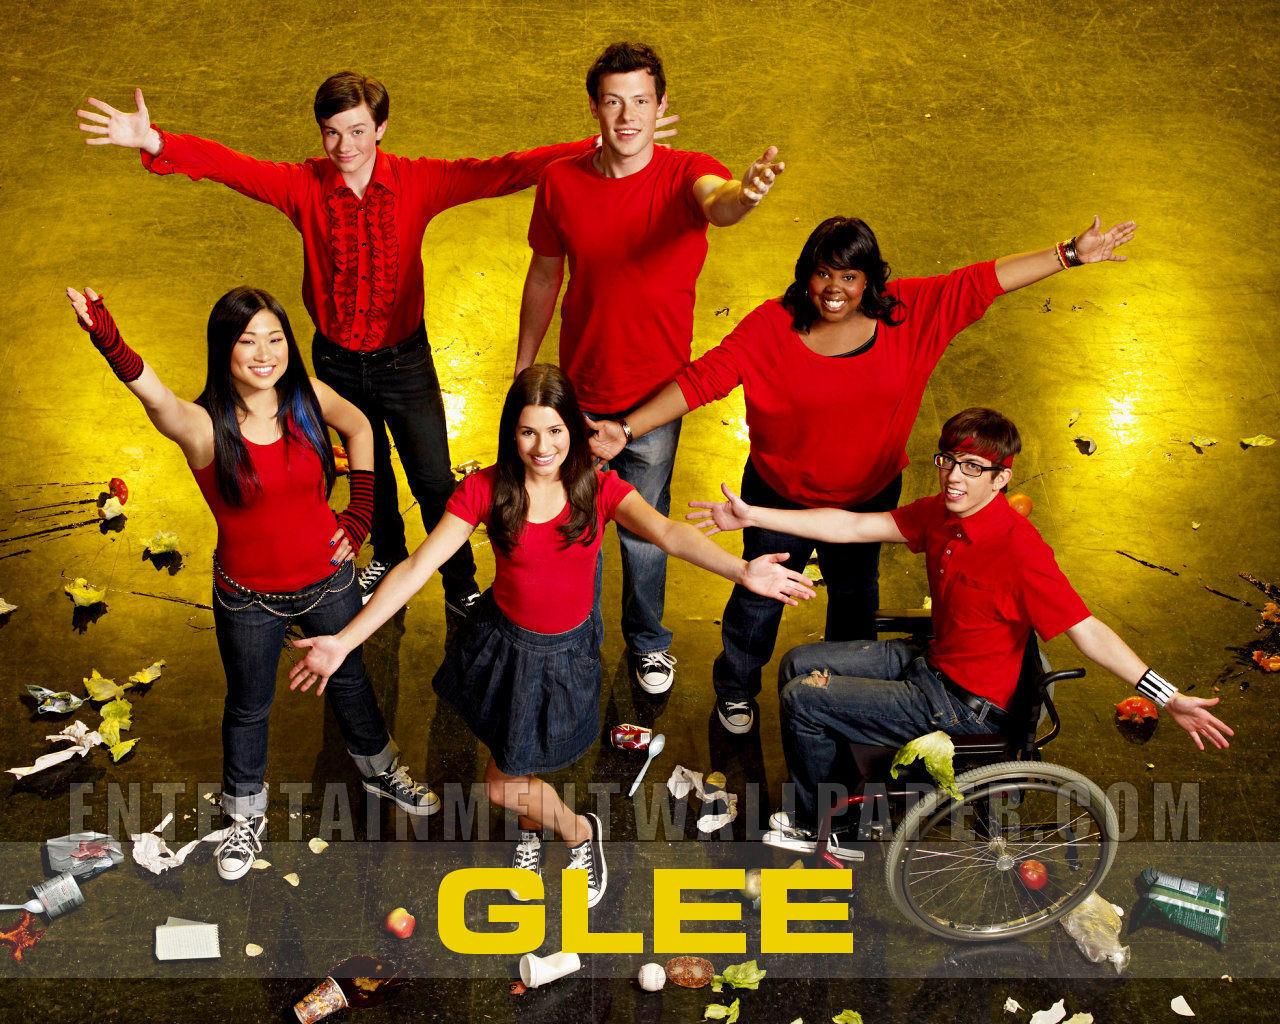 Glee Glee 1280x1024